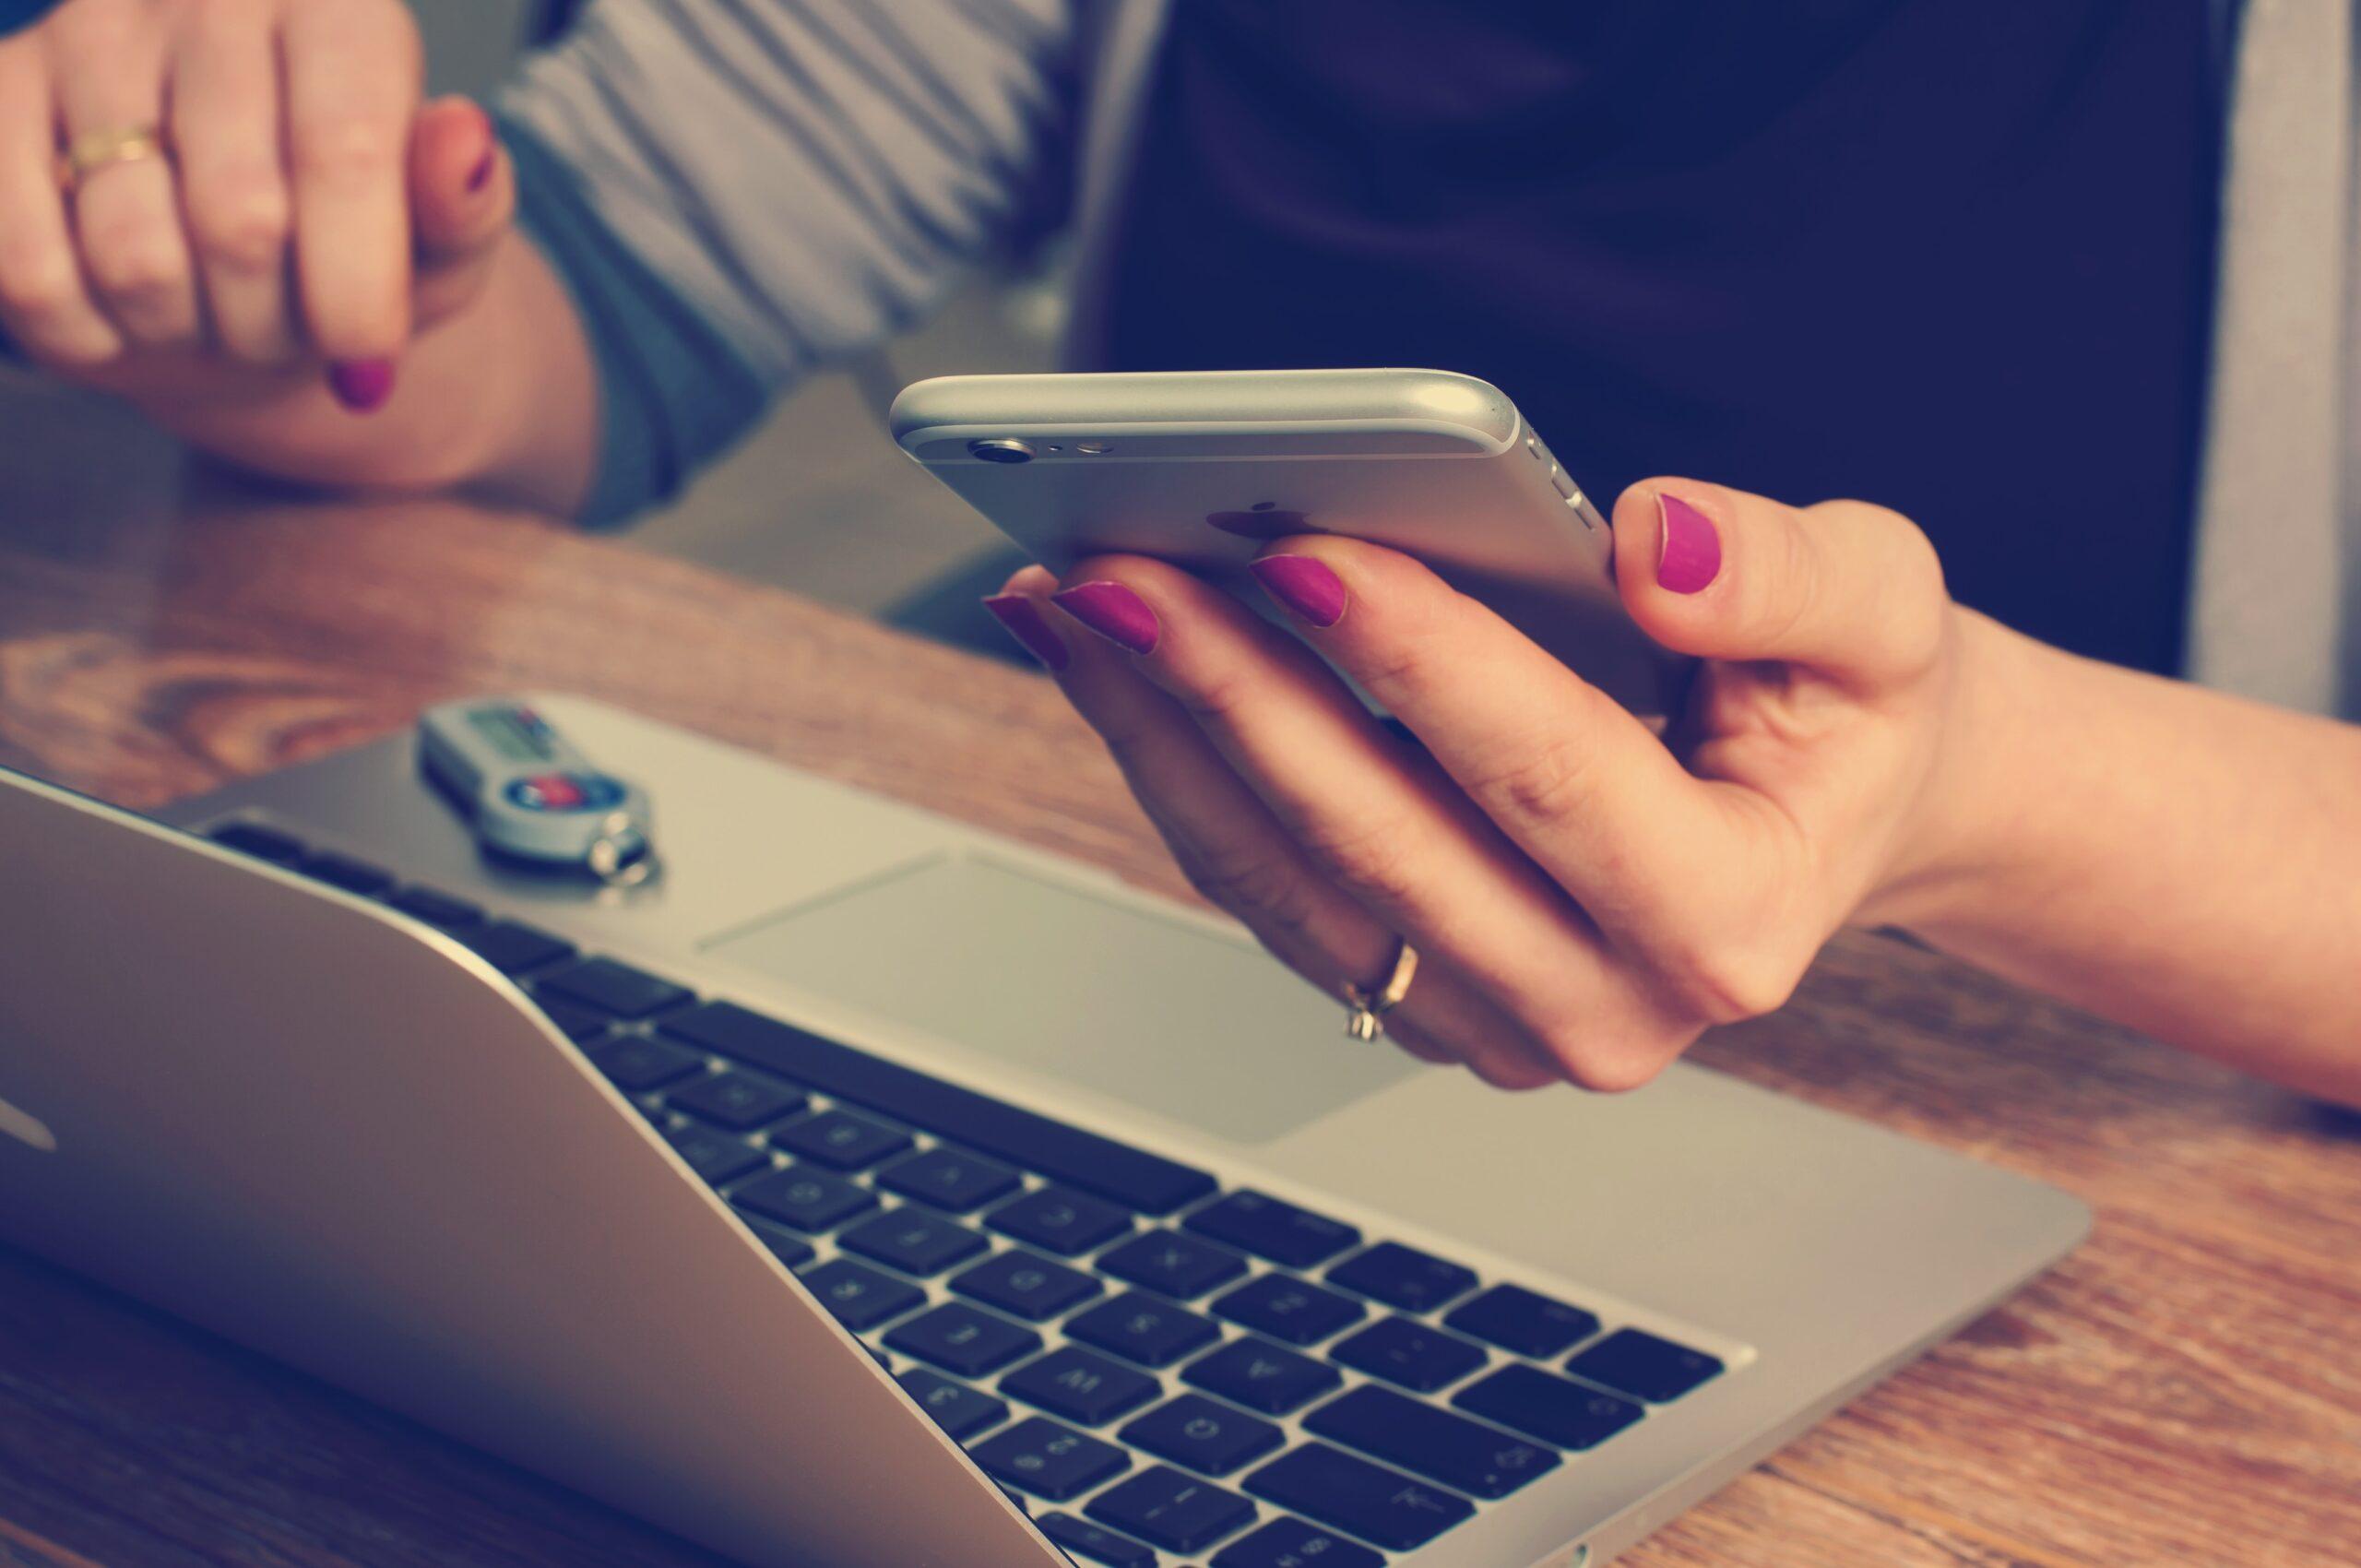 Daftar Aplikasi Digital Banking untuk Mencatat Pengeluaran